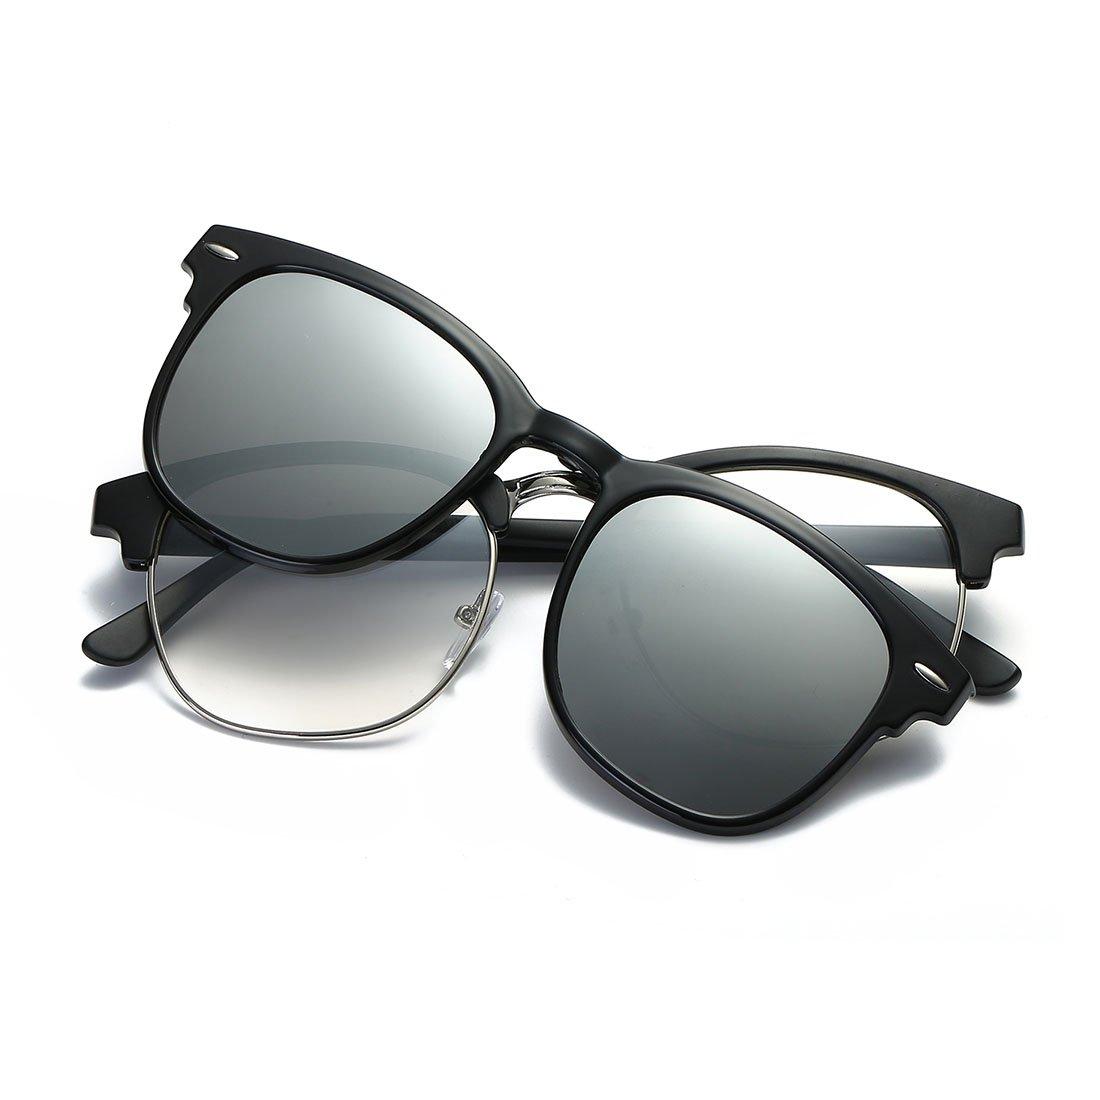 7f42586ad7a Amazon.com  AEVOGUE Magnetic Clip-on Polarized Sunglasses Mens Plastic  Titanium (TR90) Frame Unisex Prescription Glasses AE0510 (Black Sliver